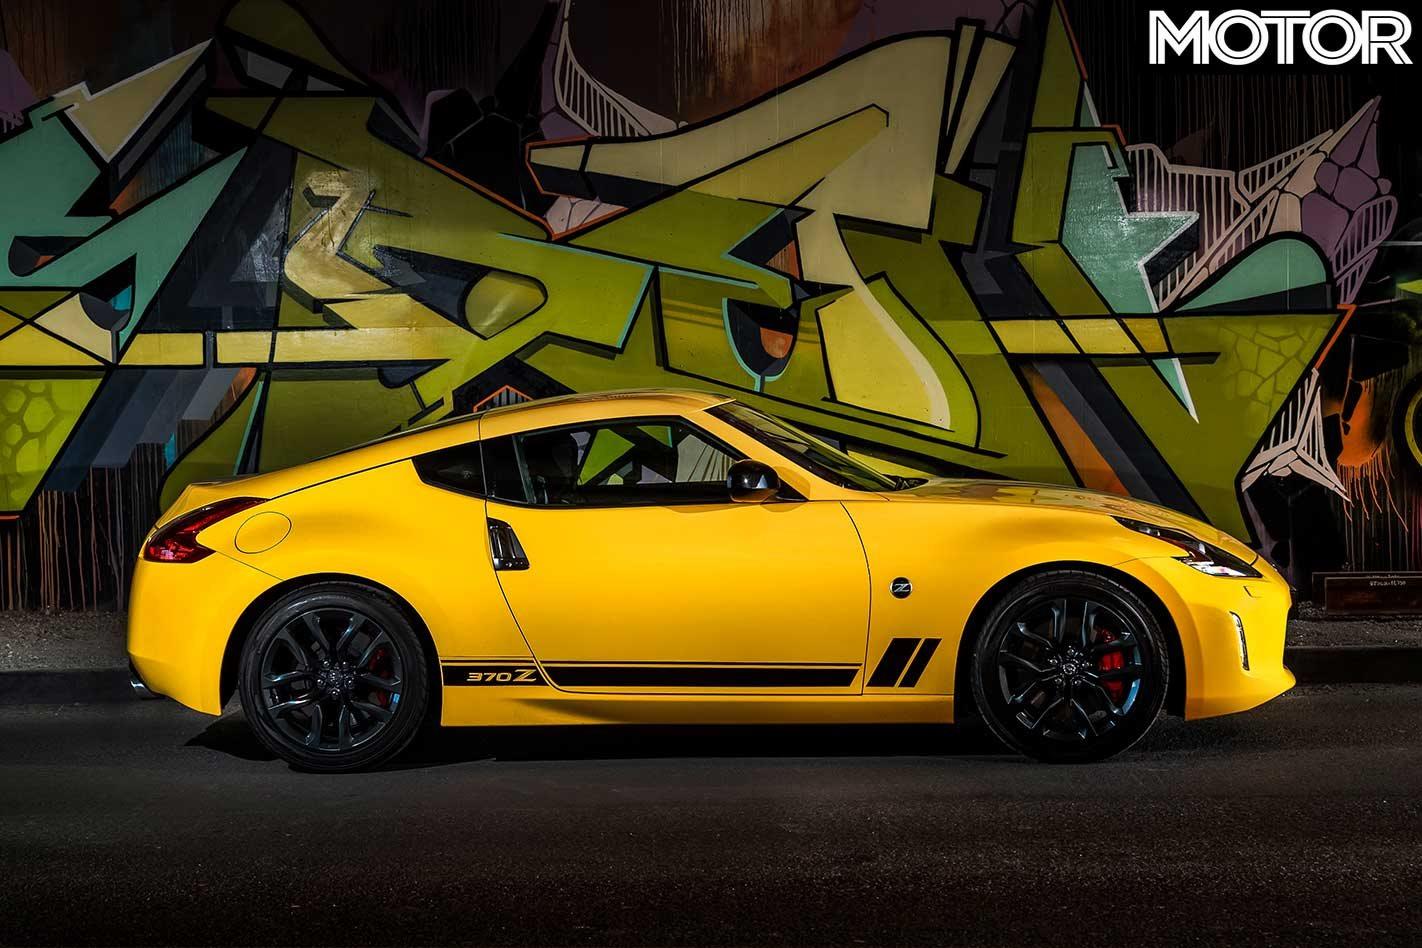 2019 Nissan 370Z N-Sport review | MOTOR